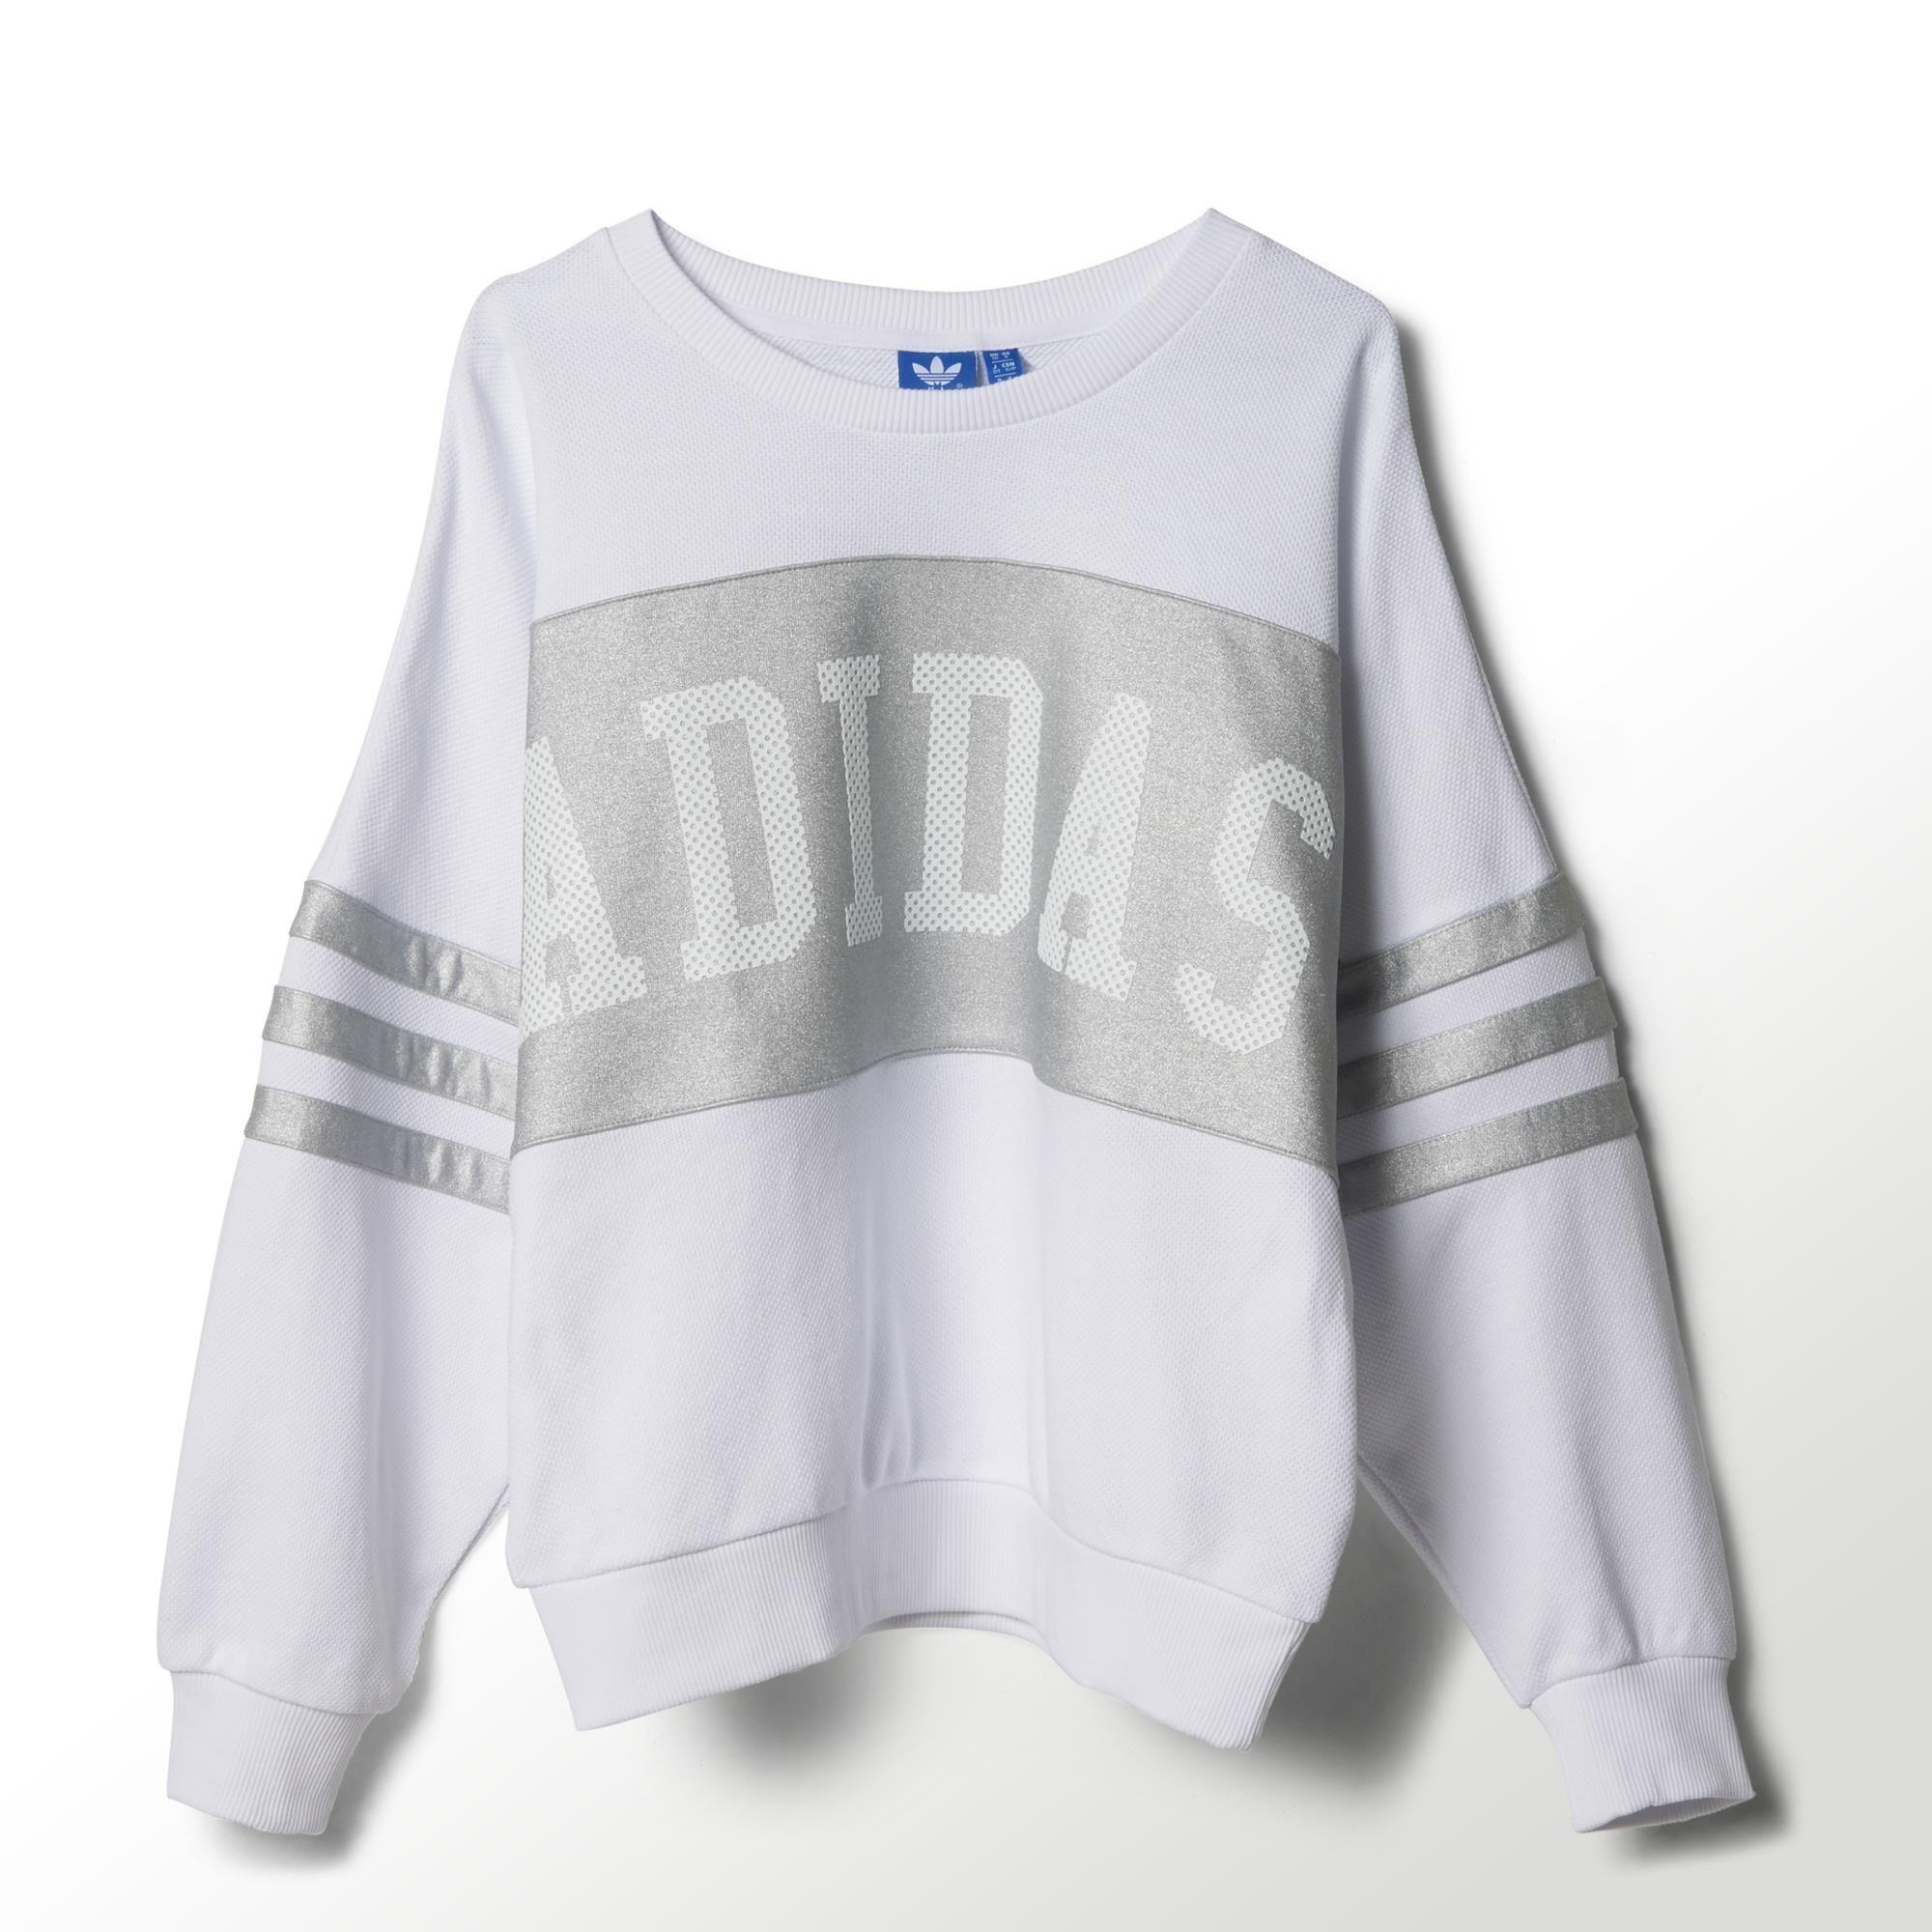 NEW! ADIDAS ORIGINALS NMD Crew Felpa Sweatshirt Sz Small